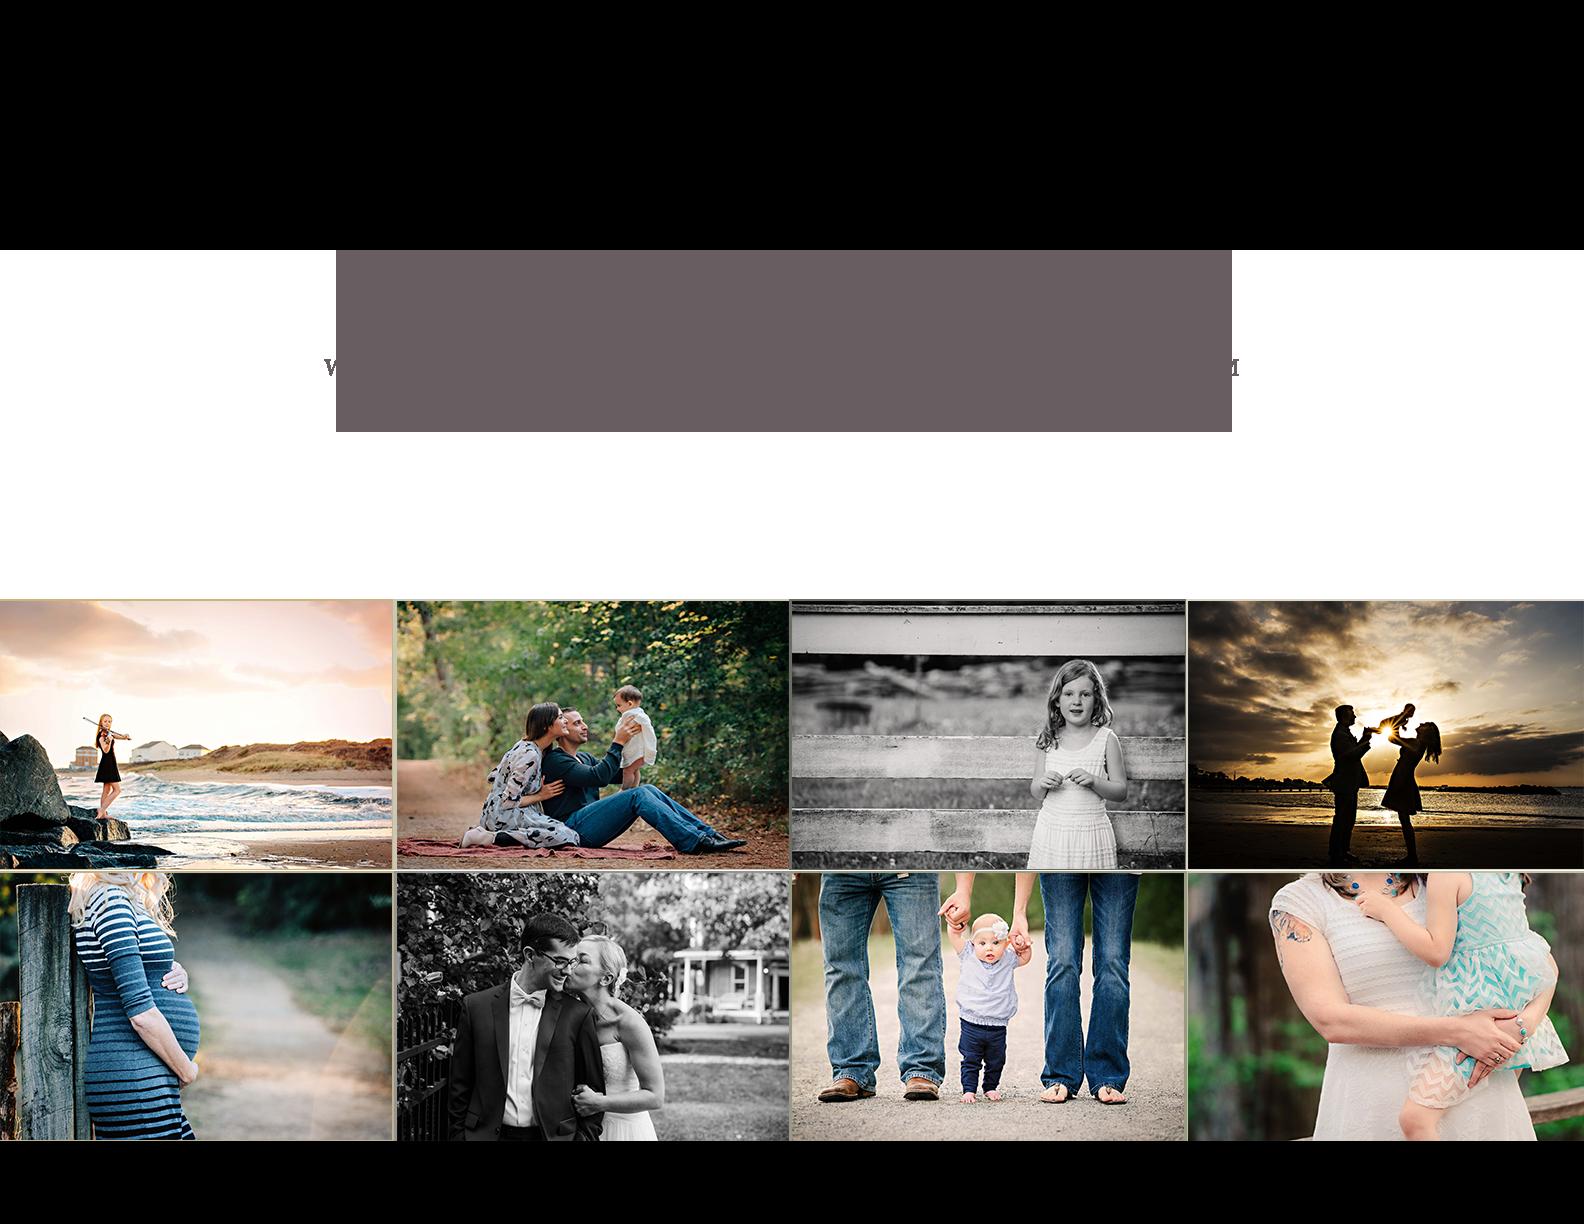 norfolk-virginia-beach-chesapeake-family-lifestyle-photographers-melissa-bliss-photography-fall-photo-sessions-hampton-roads-va